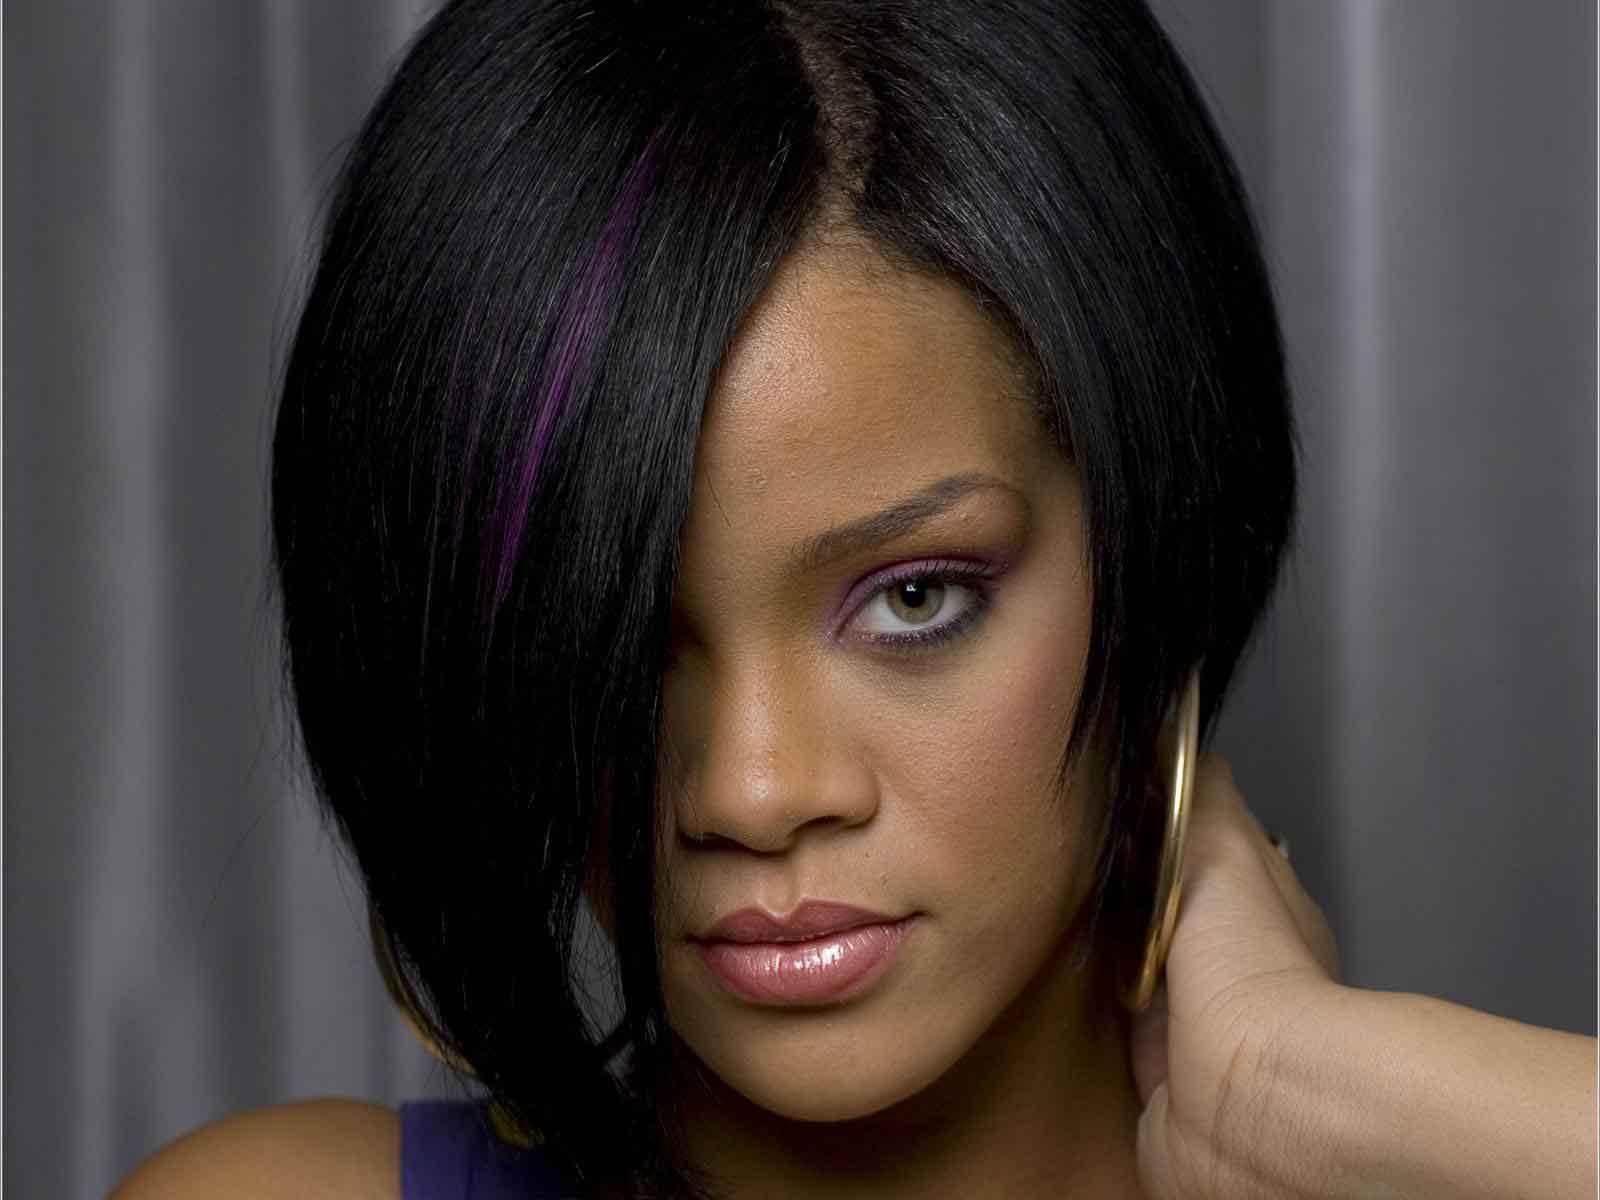 Rihanna Hairstyles 2017 2018 – Short Medium and Long Length Hair